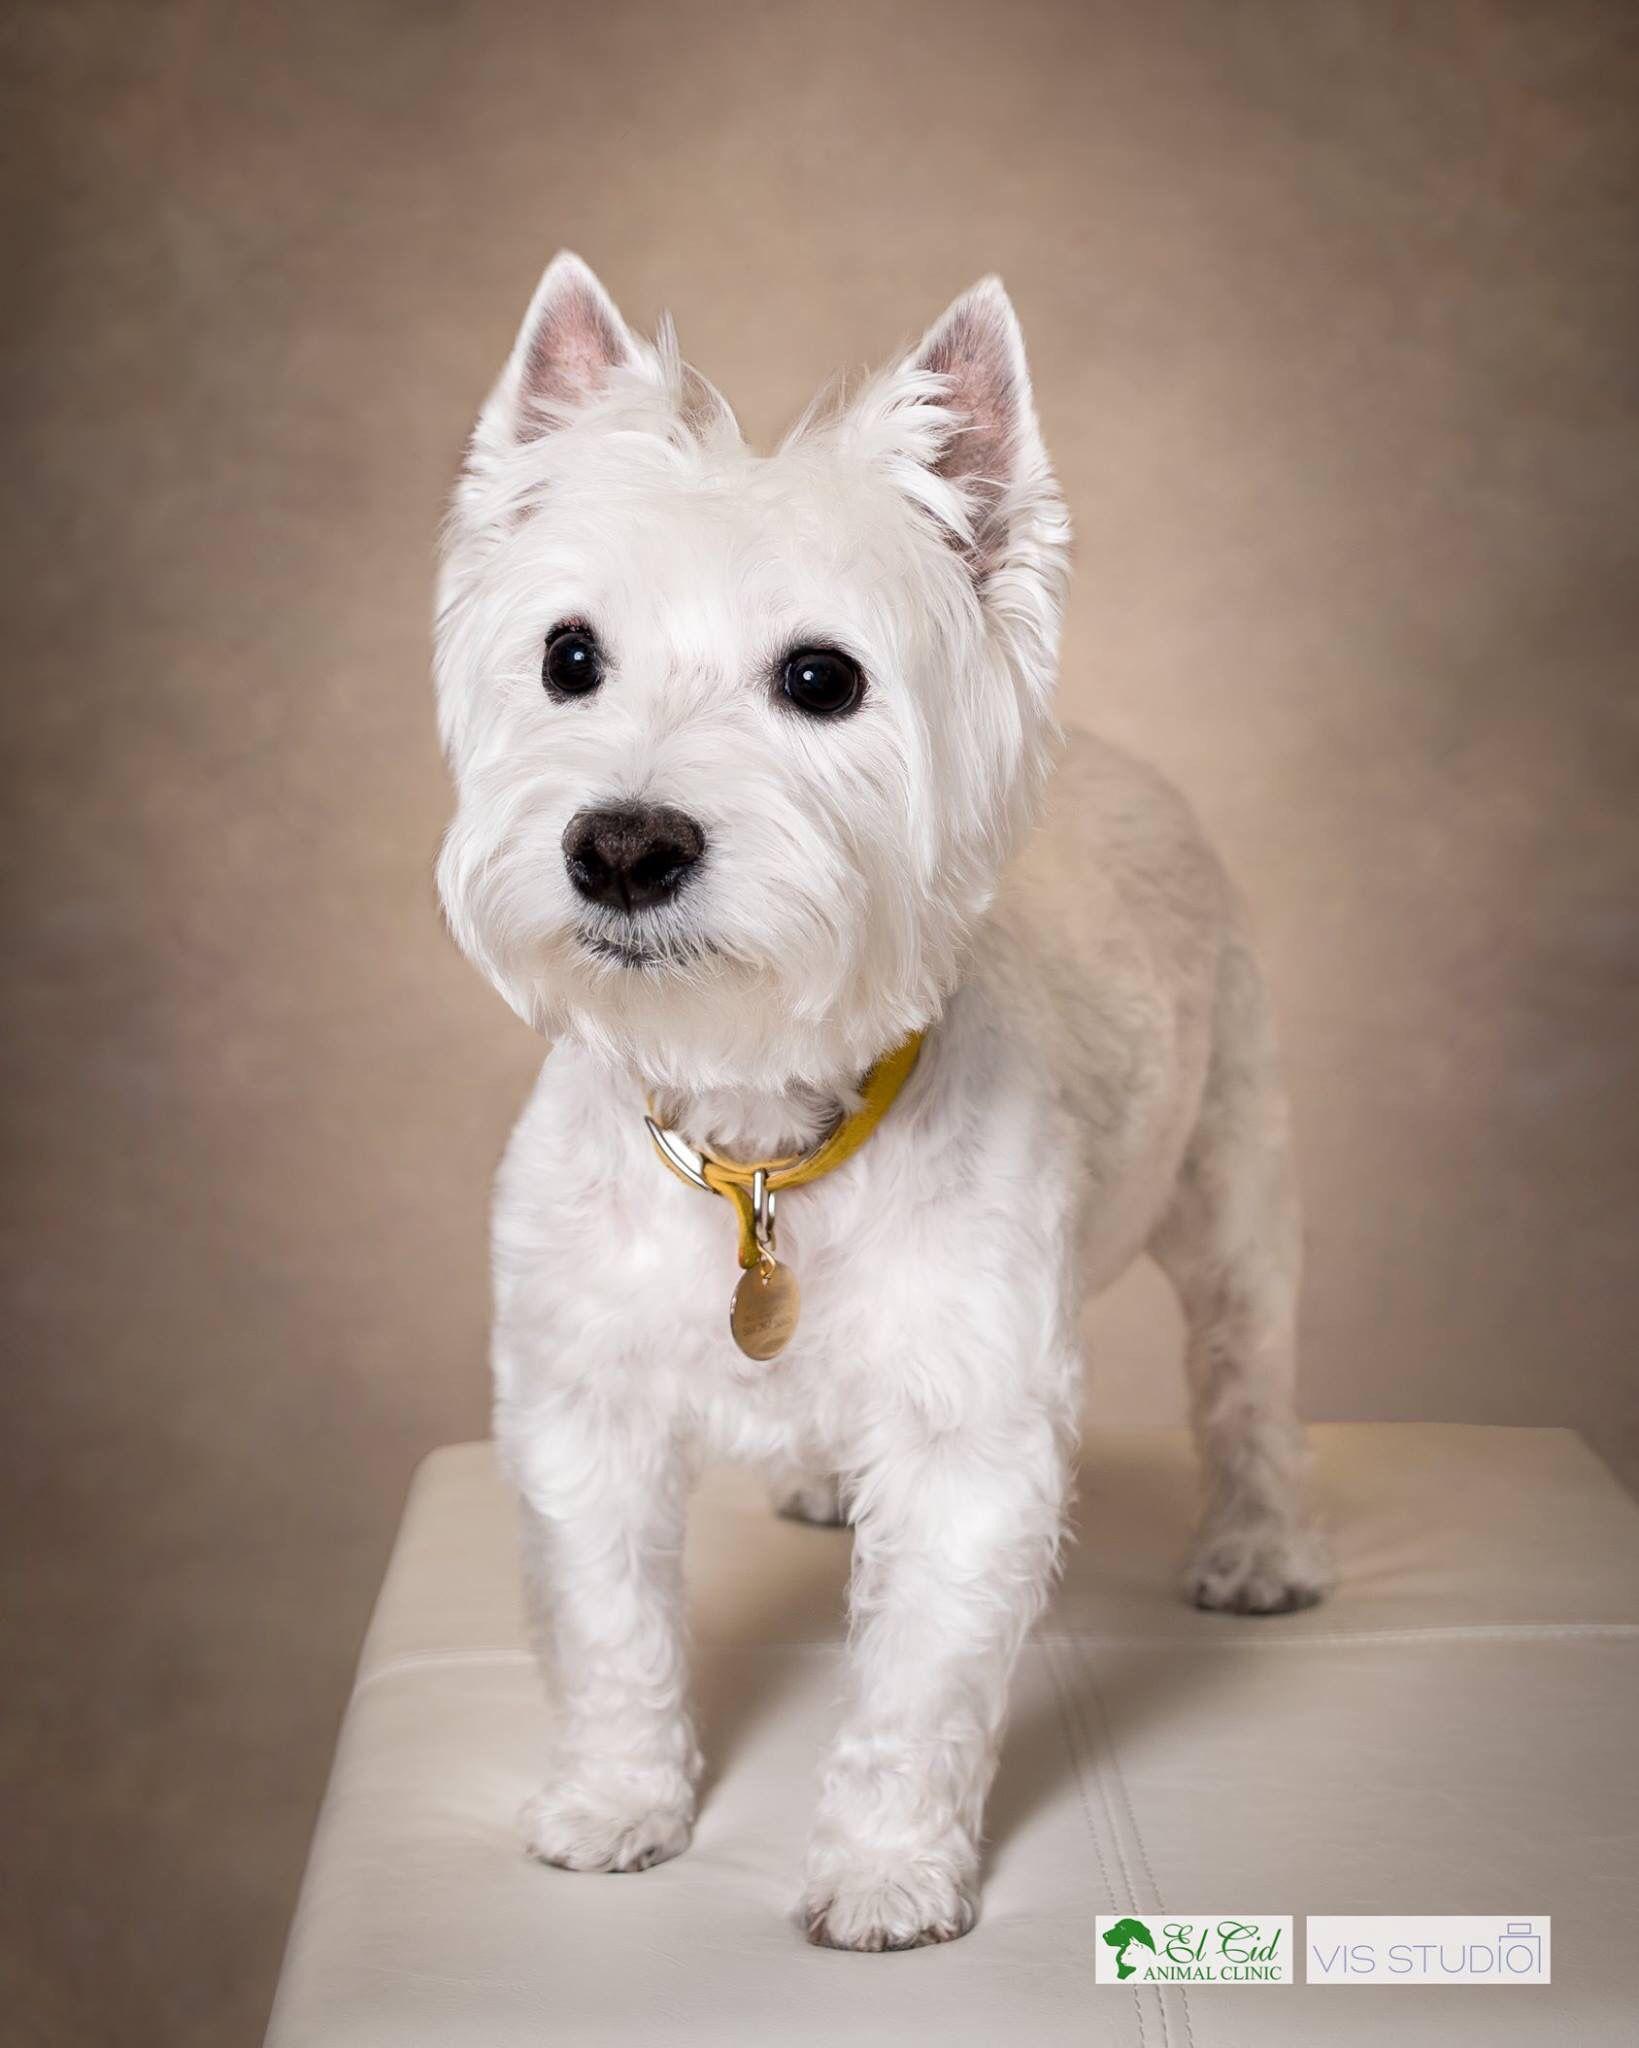 El Cid Animal Clinic Pet Photographer Pet Photography Dog Photographer Dog Photos Dog Photography Palm B Dog Photograph Animal Photography Dog Photography